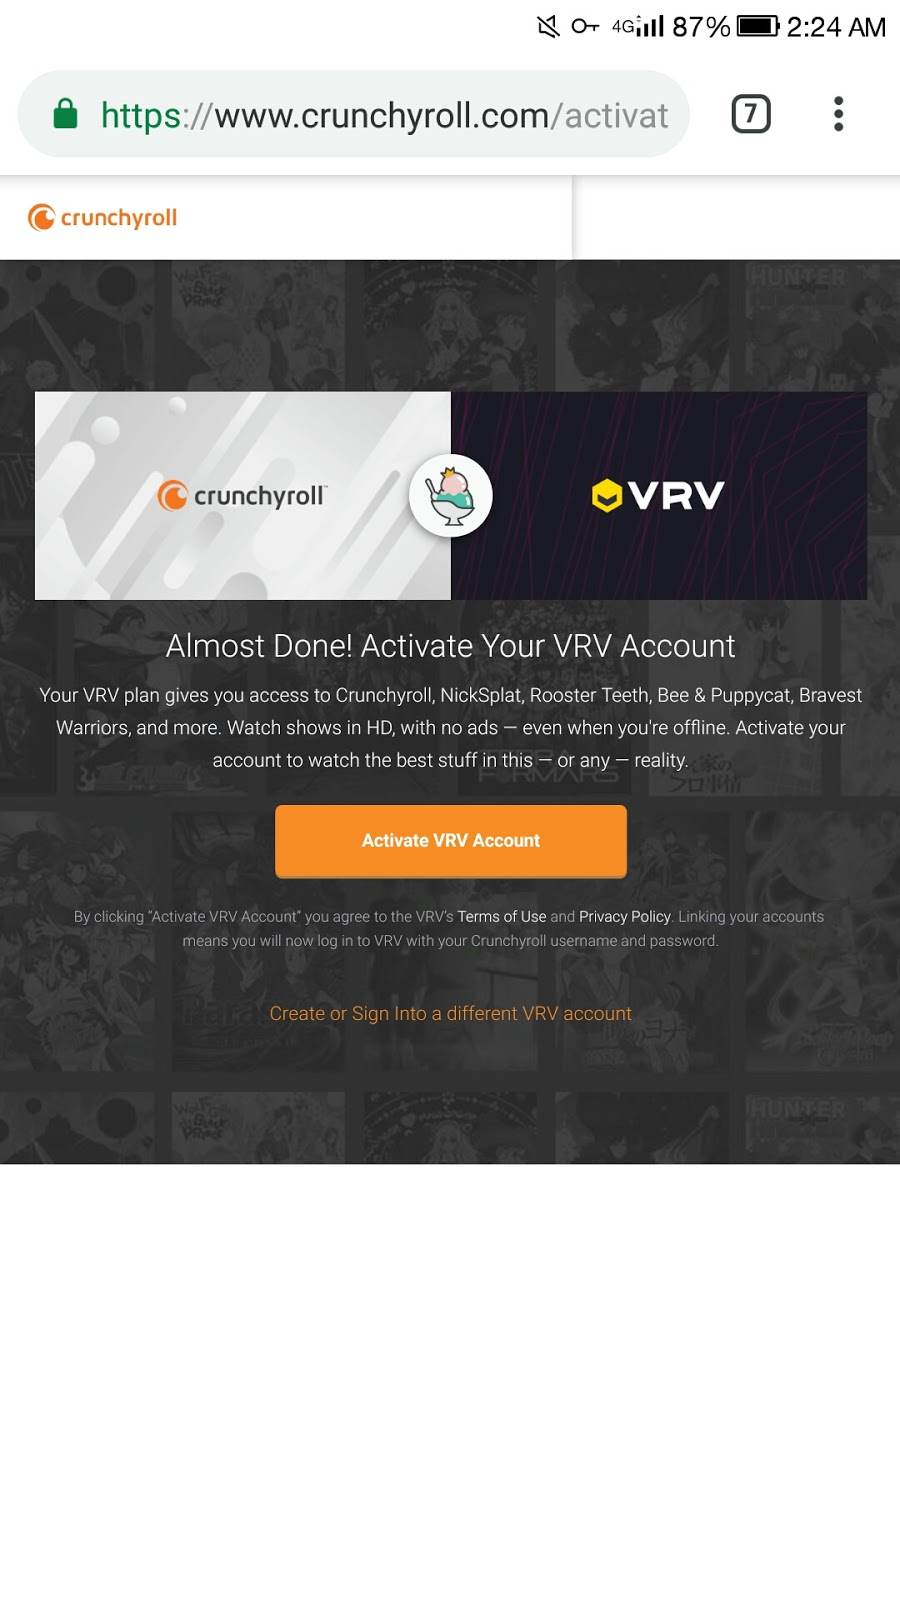 Crunchyroll and Deezer Free premium accounts - DroidVilla Tech